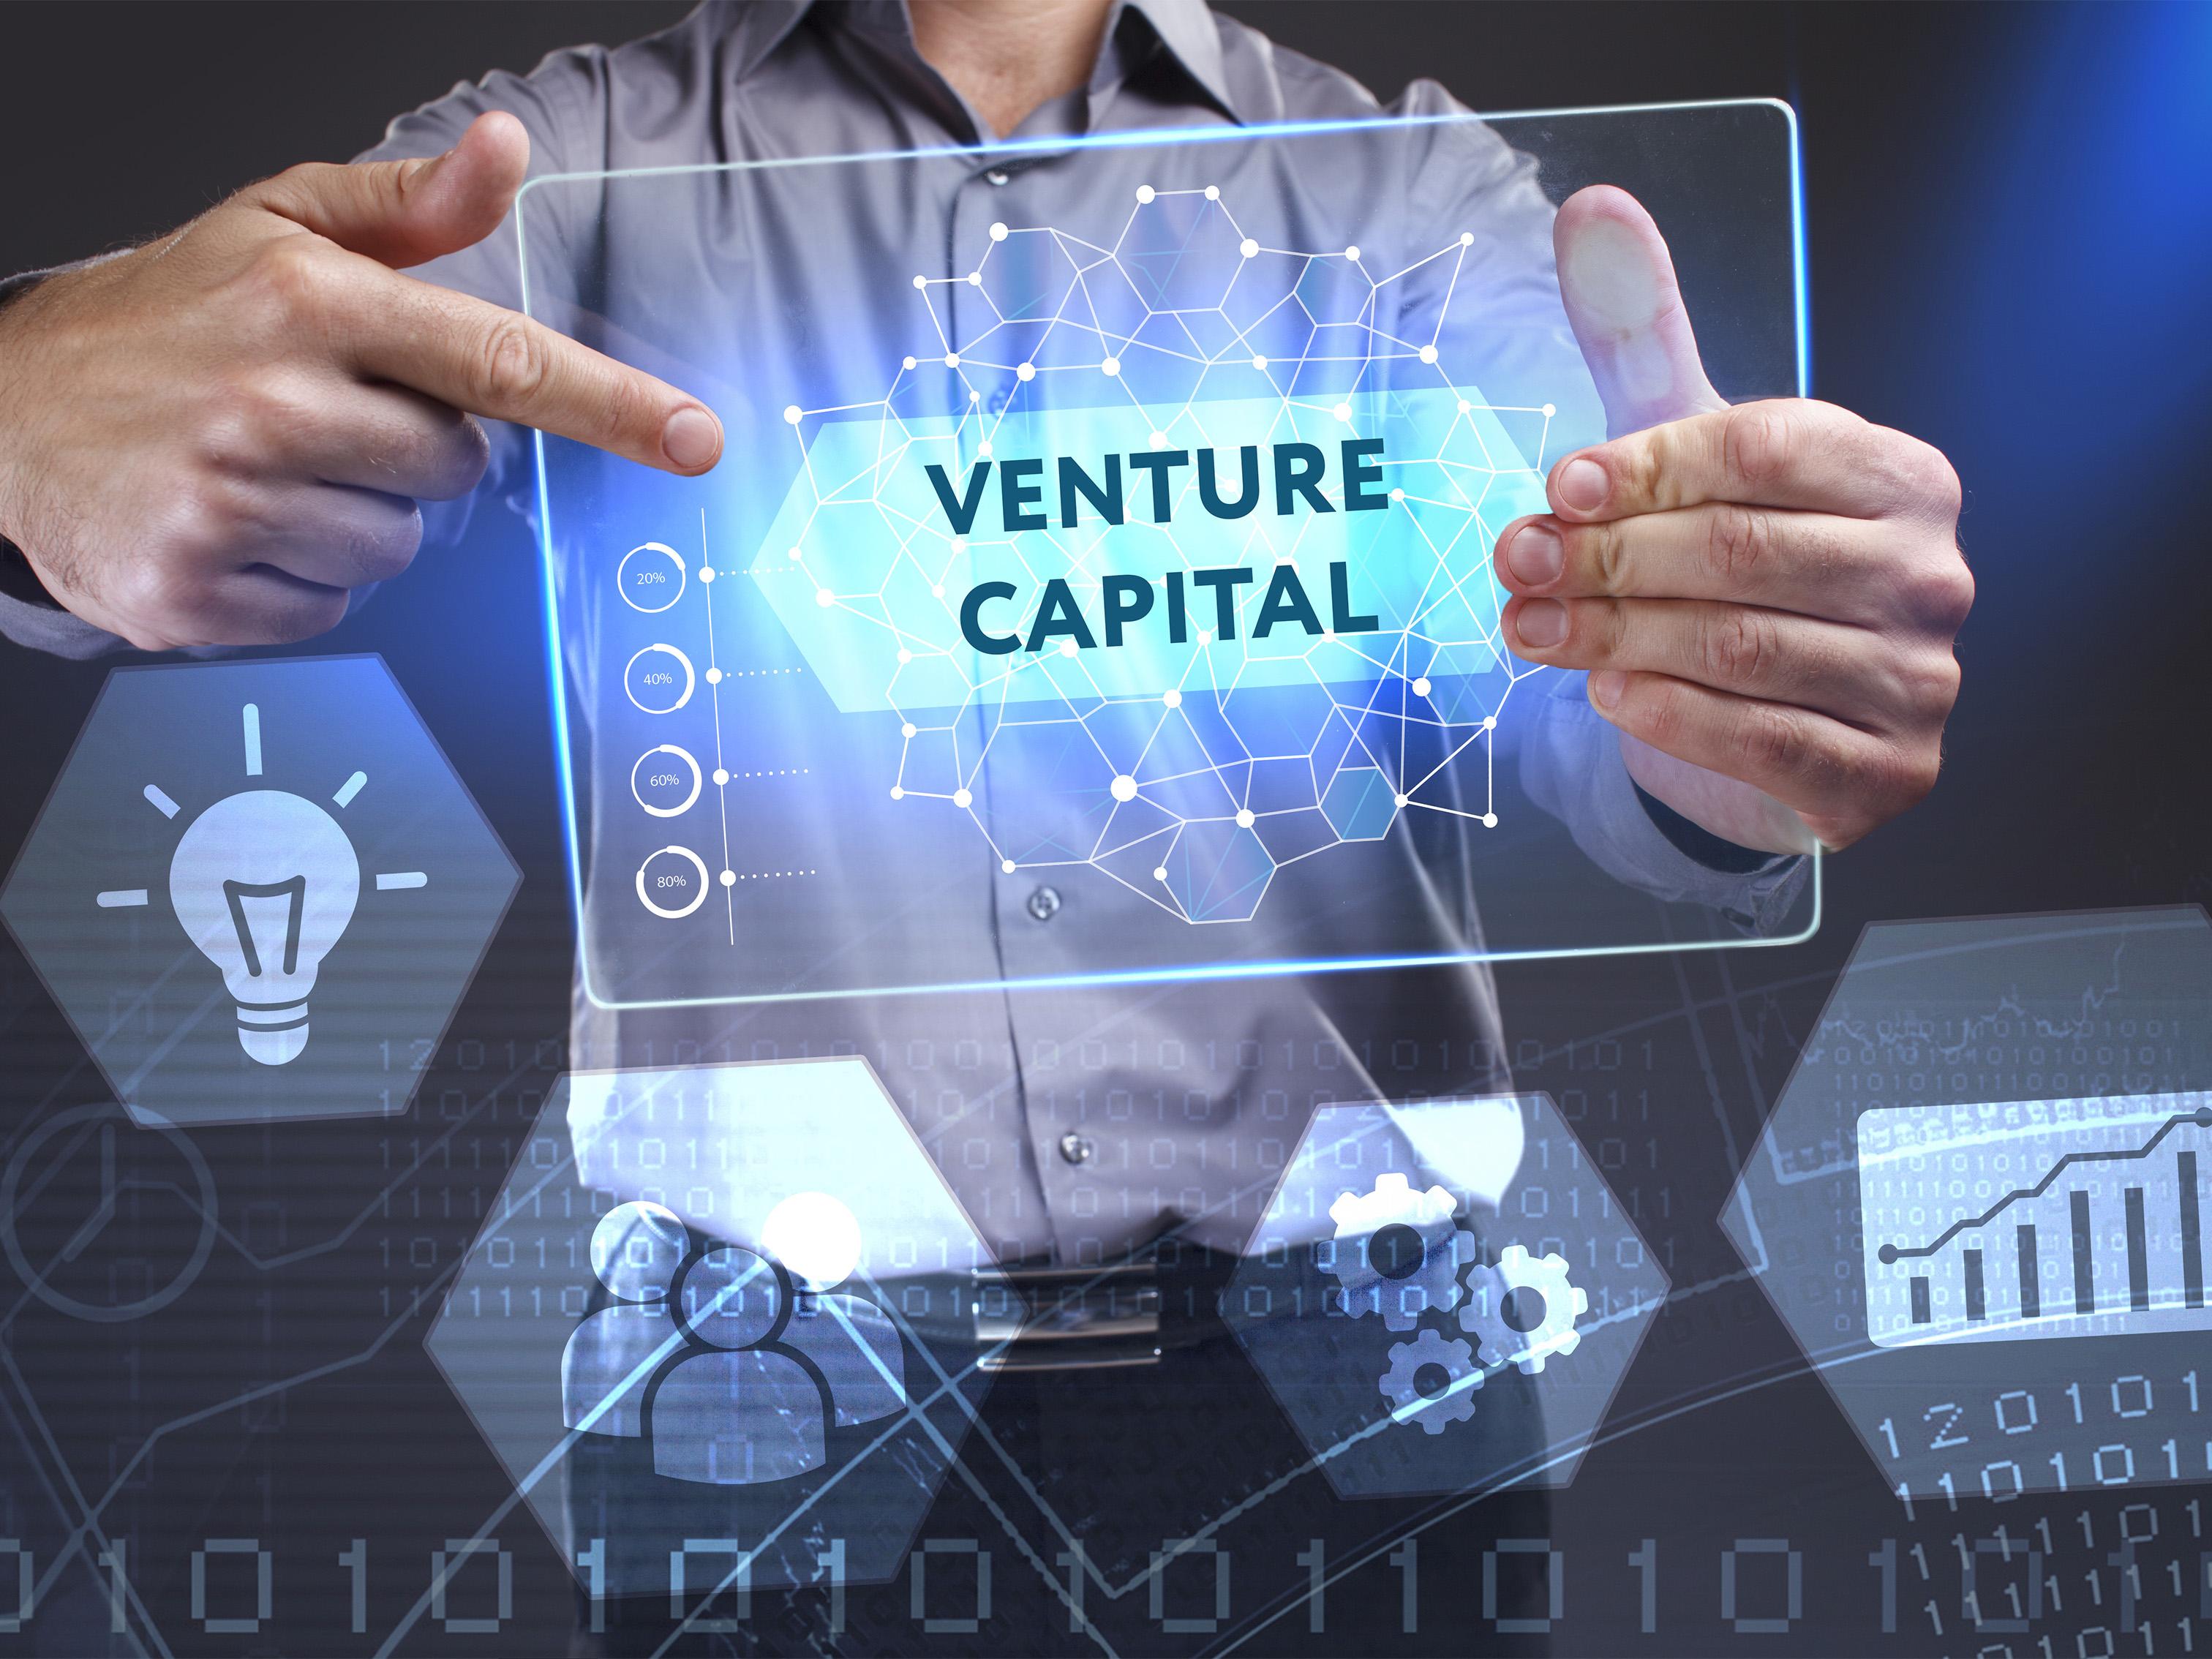 venture capital rodney adler image